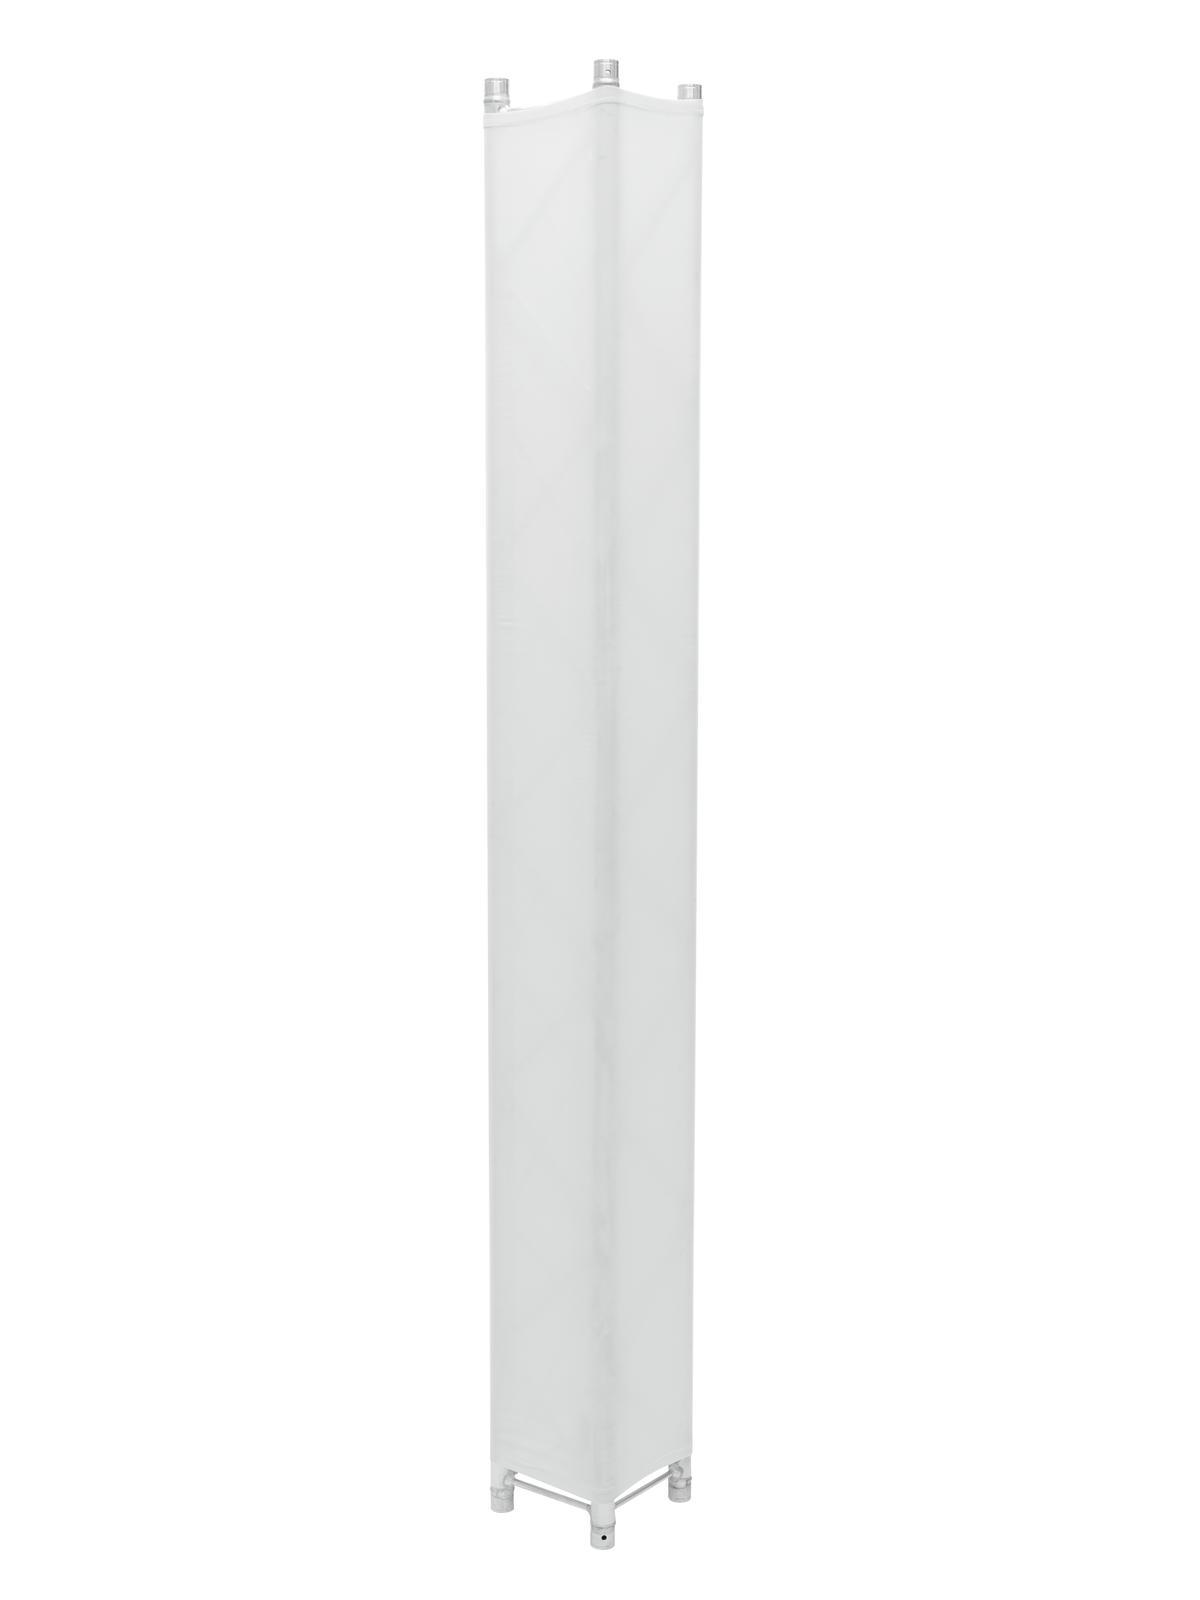 EXPAND Trusscover für Decolock 300cm weiß